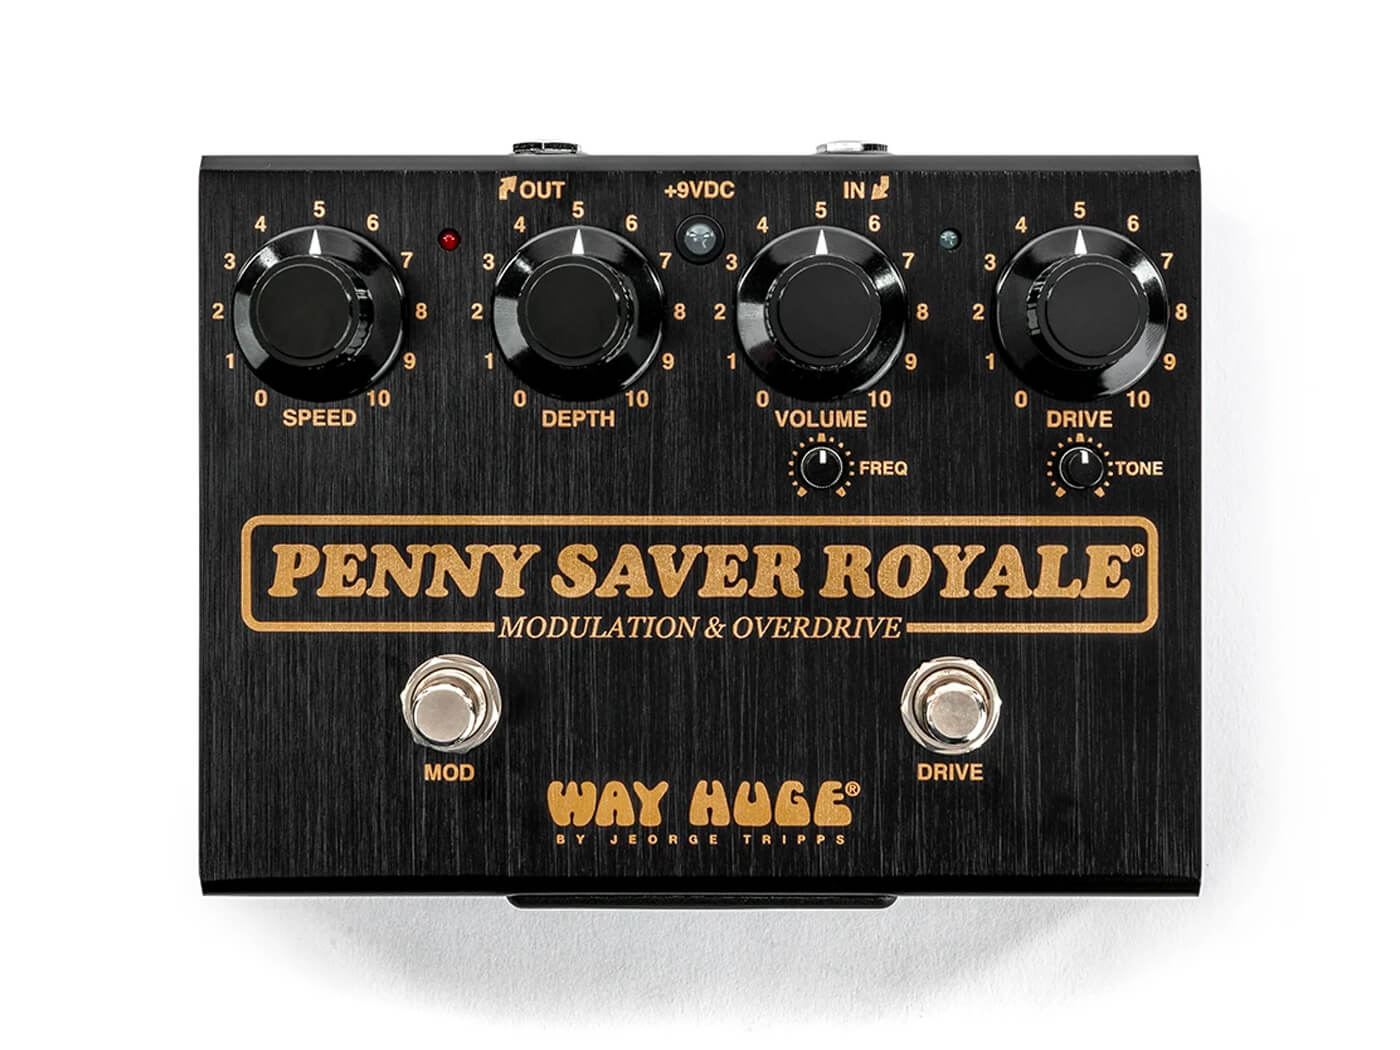 Joe Bonamassa teams up with Way Huge on the Penny Saver Royale OD/chorus pedal